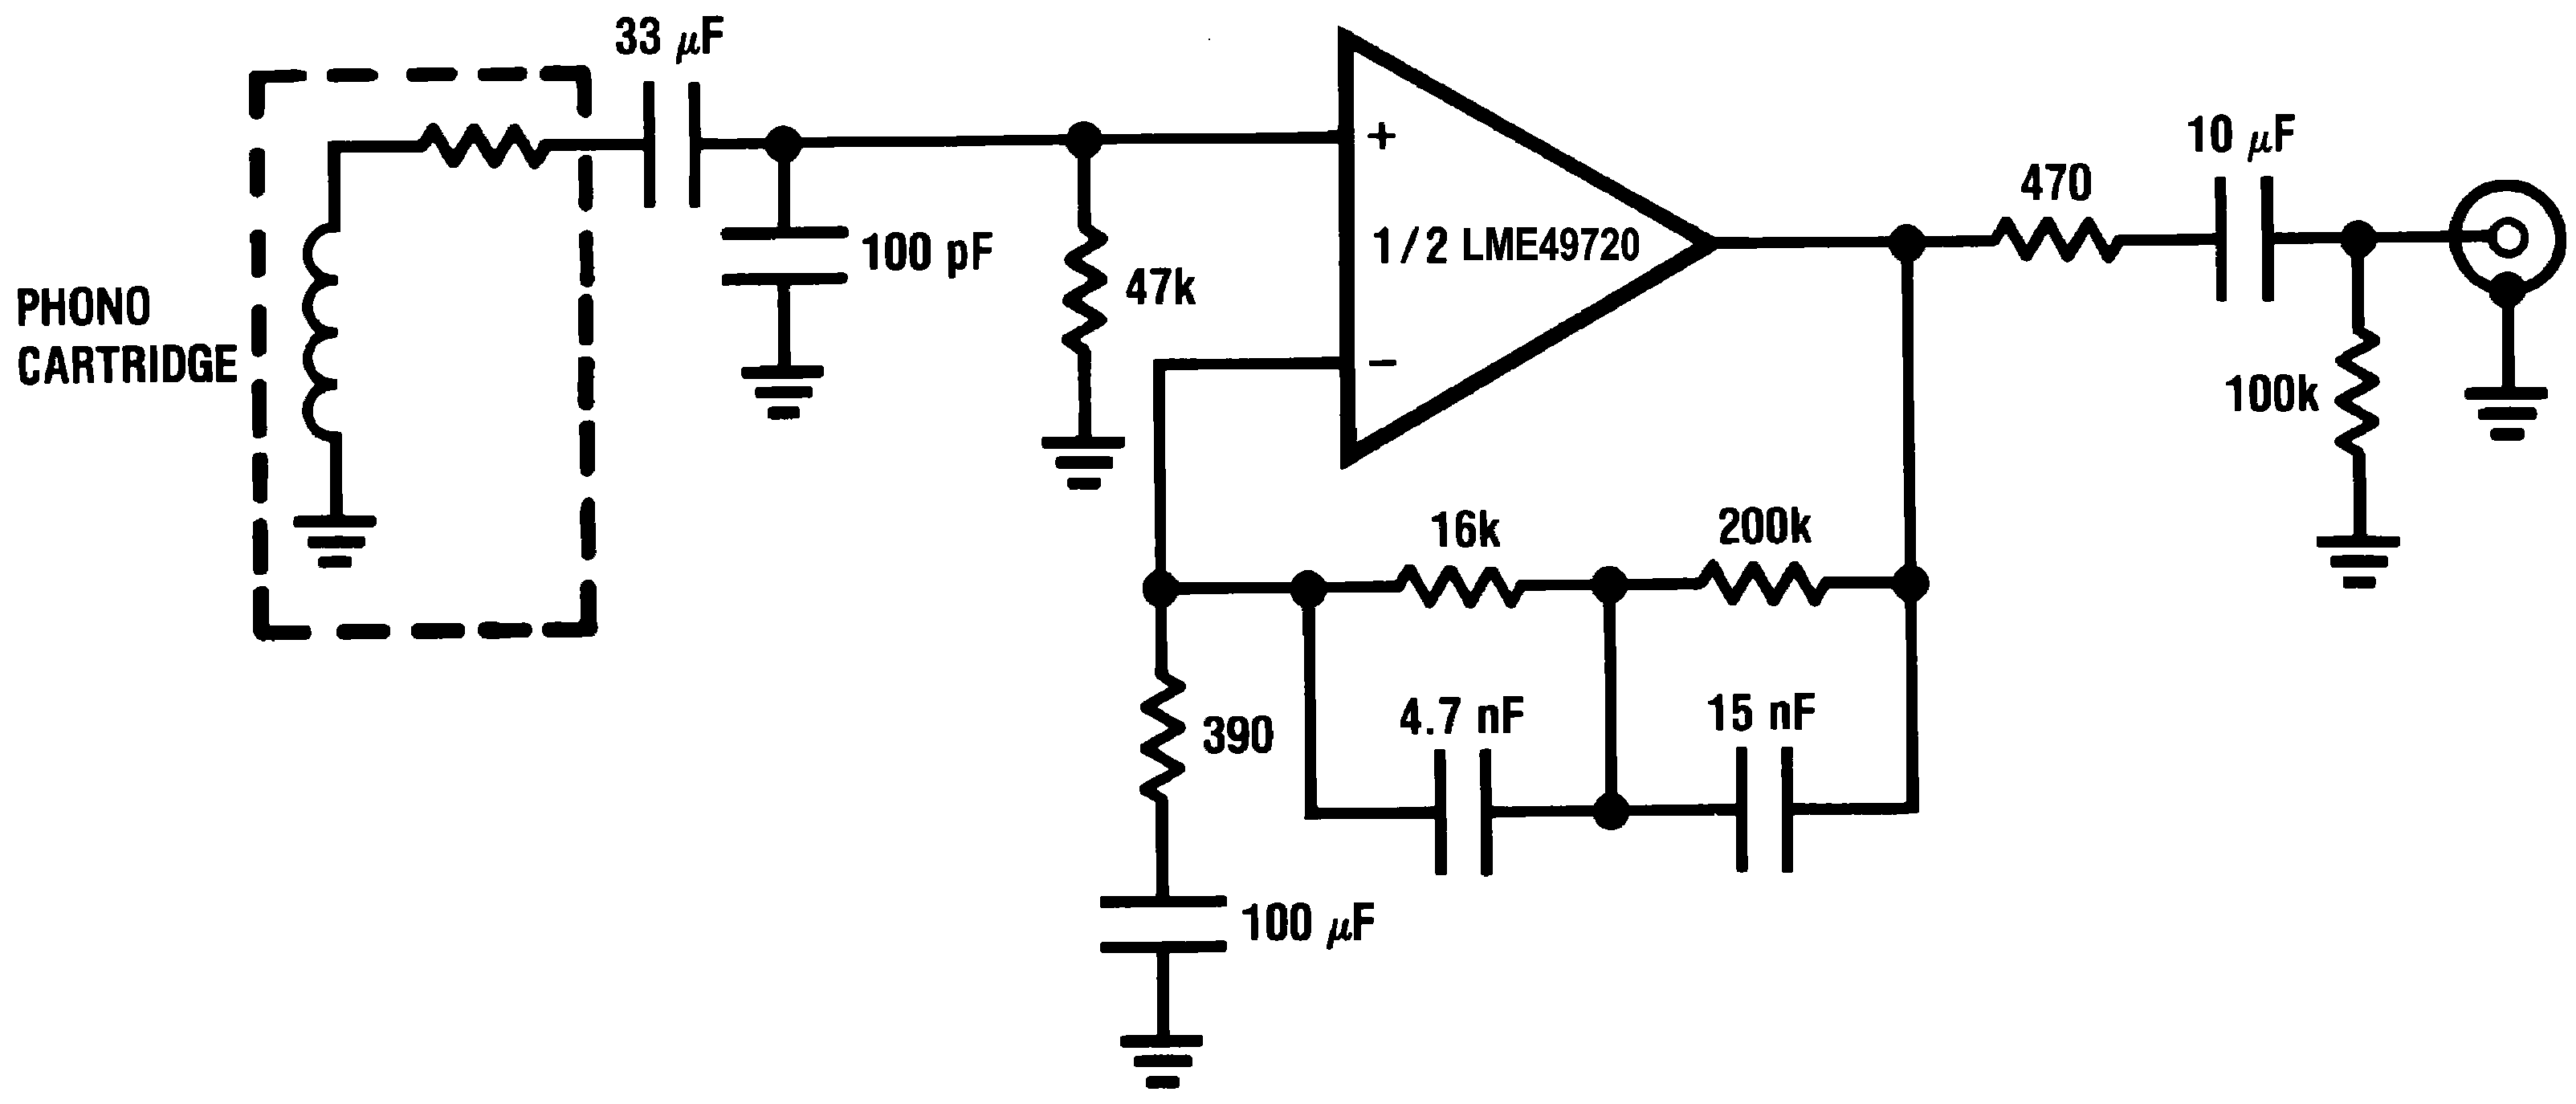 Lme49720 Riaa Equalization Circuit 30003803